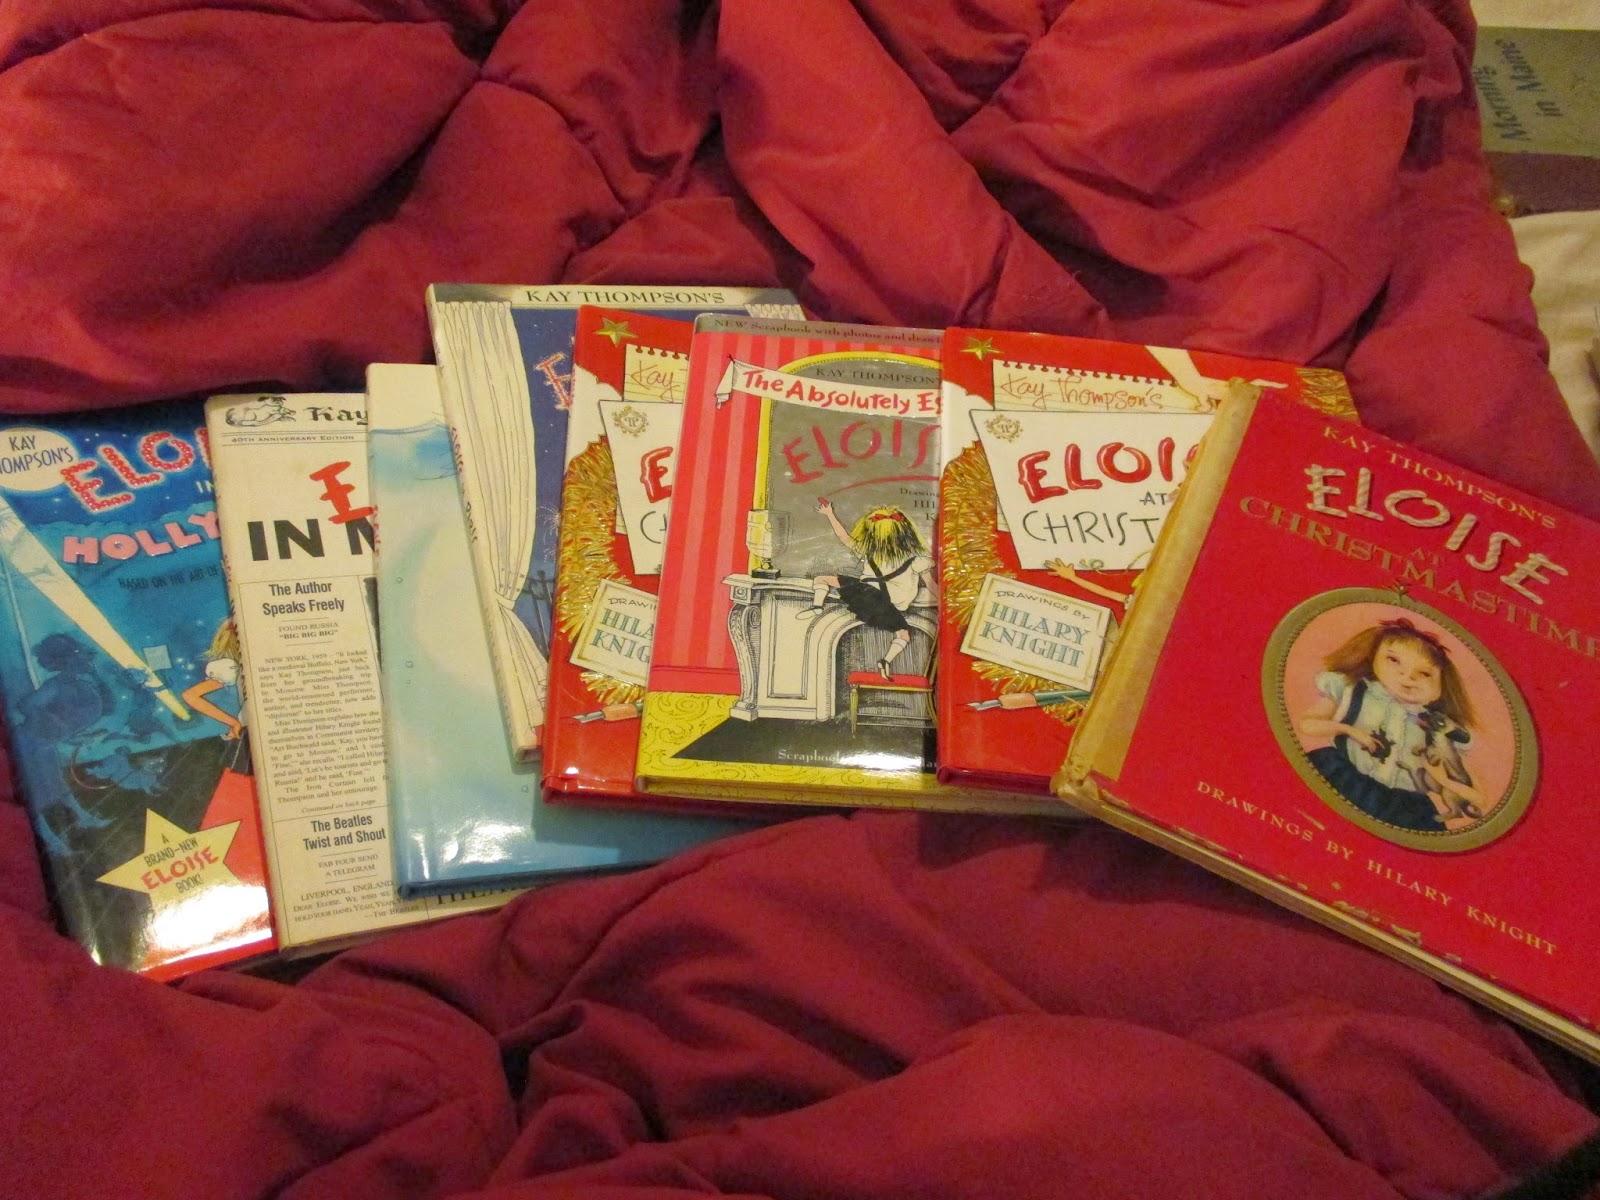 Eloise books, Kay Thompson, Hilary Knight